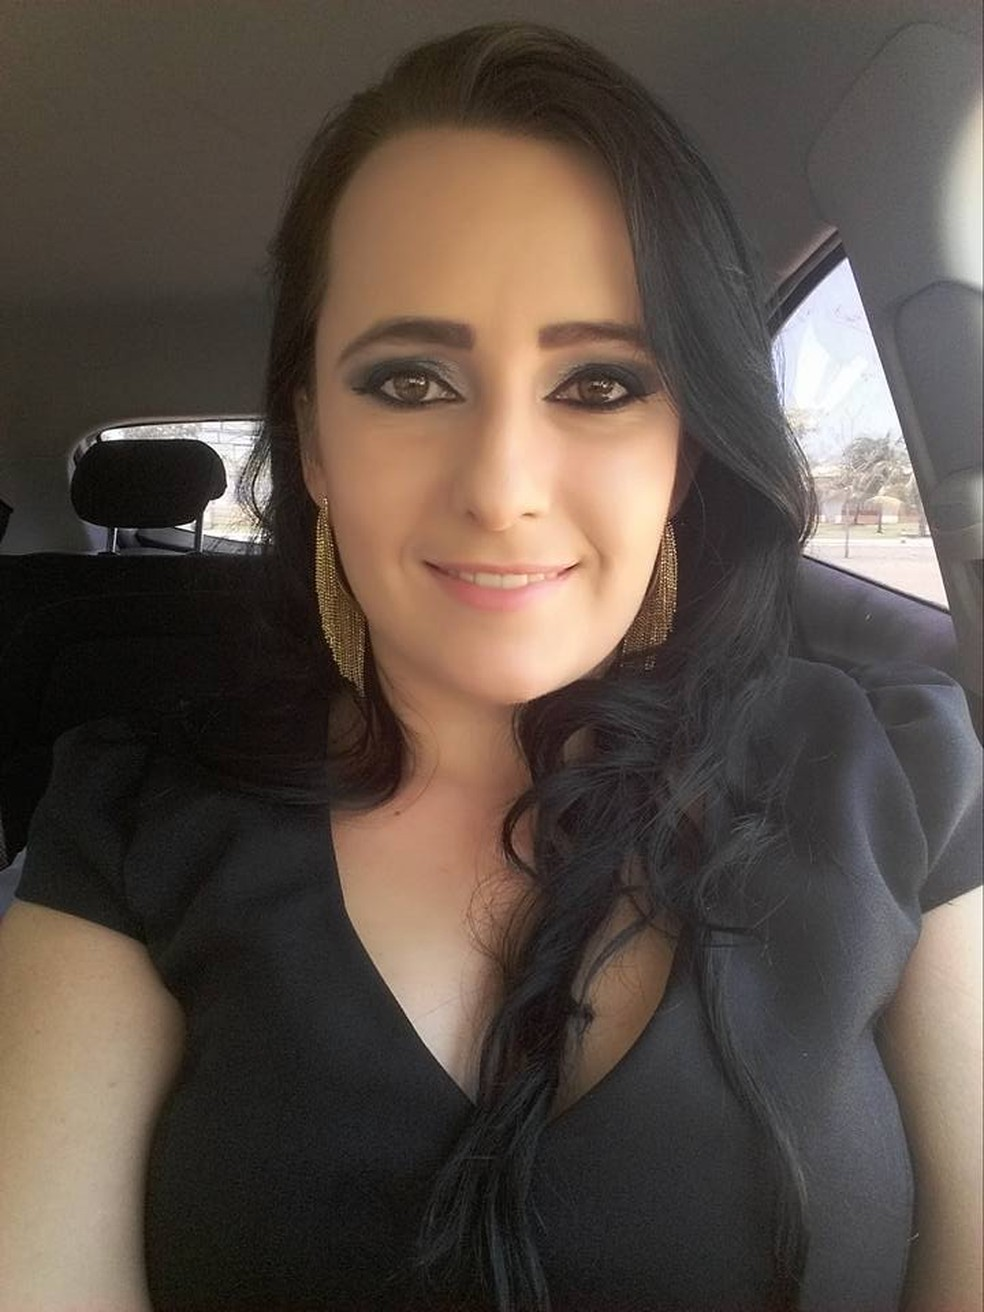 A vítima foi identificada como Joslene Benetti, de 32 anos (Foto: Reprodução/Facebook)